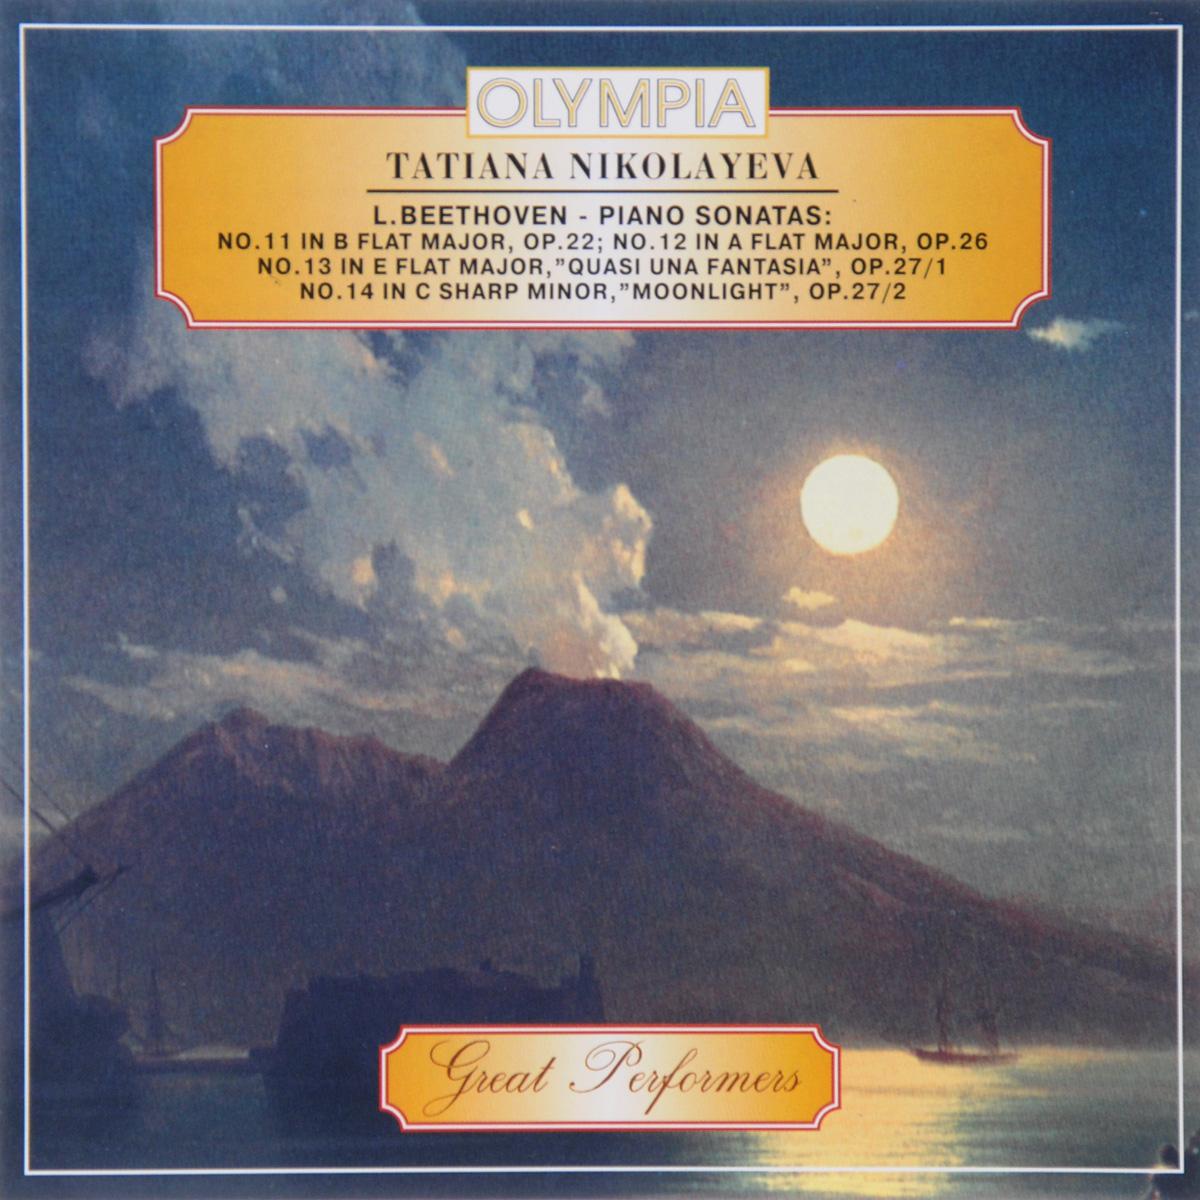 все цены на Татьяна Николаева Tatiana Nikolayeva. L. Beethoven. Piano Sonatas: Nos. 11, 12, 13, 14 онлайн